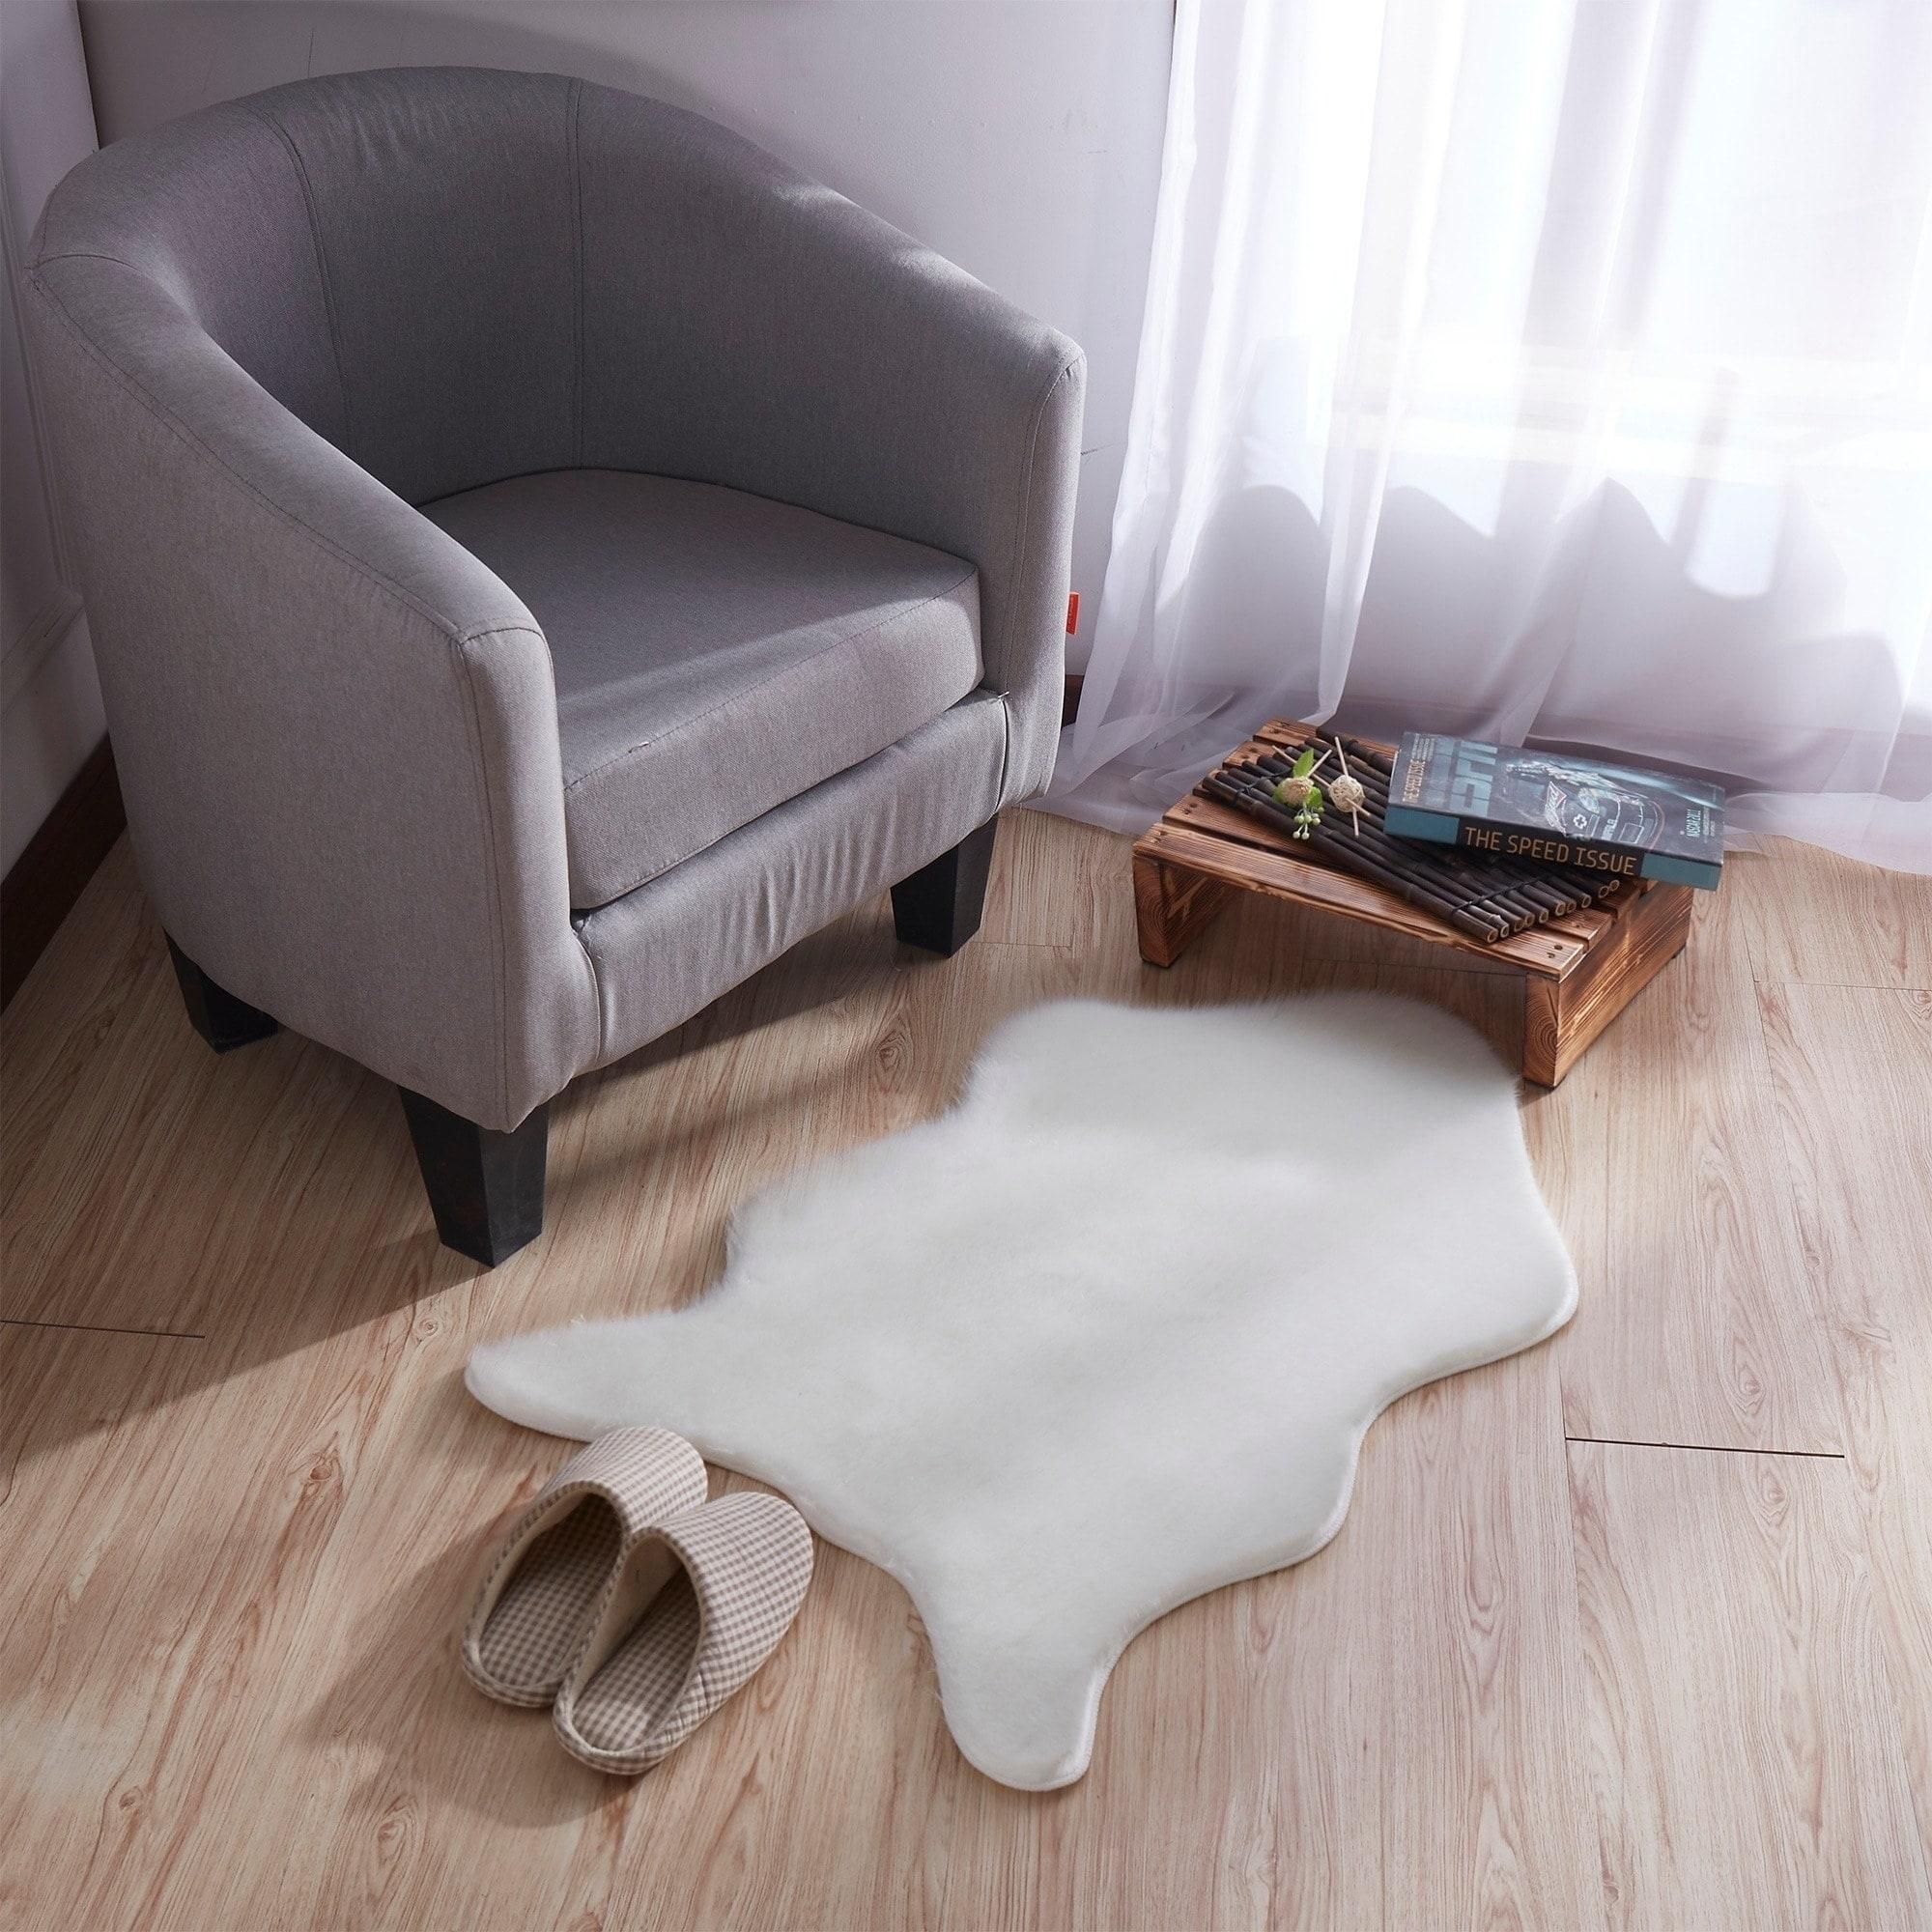 Attirant Shop Ottomanson Soft Faux Sheepskin Chair Cover Seat Pad Shag Rug   2u0027 X 3u0027    Free Shipping On Orders Over $45   Overstock.com   20554310